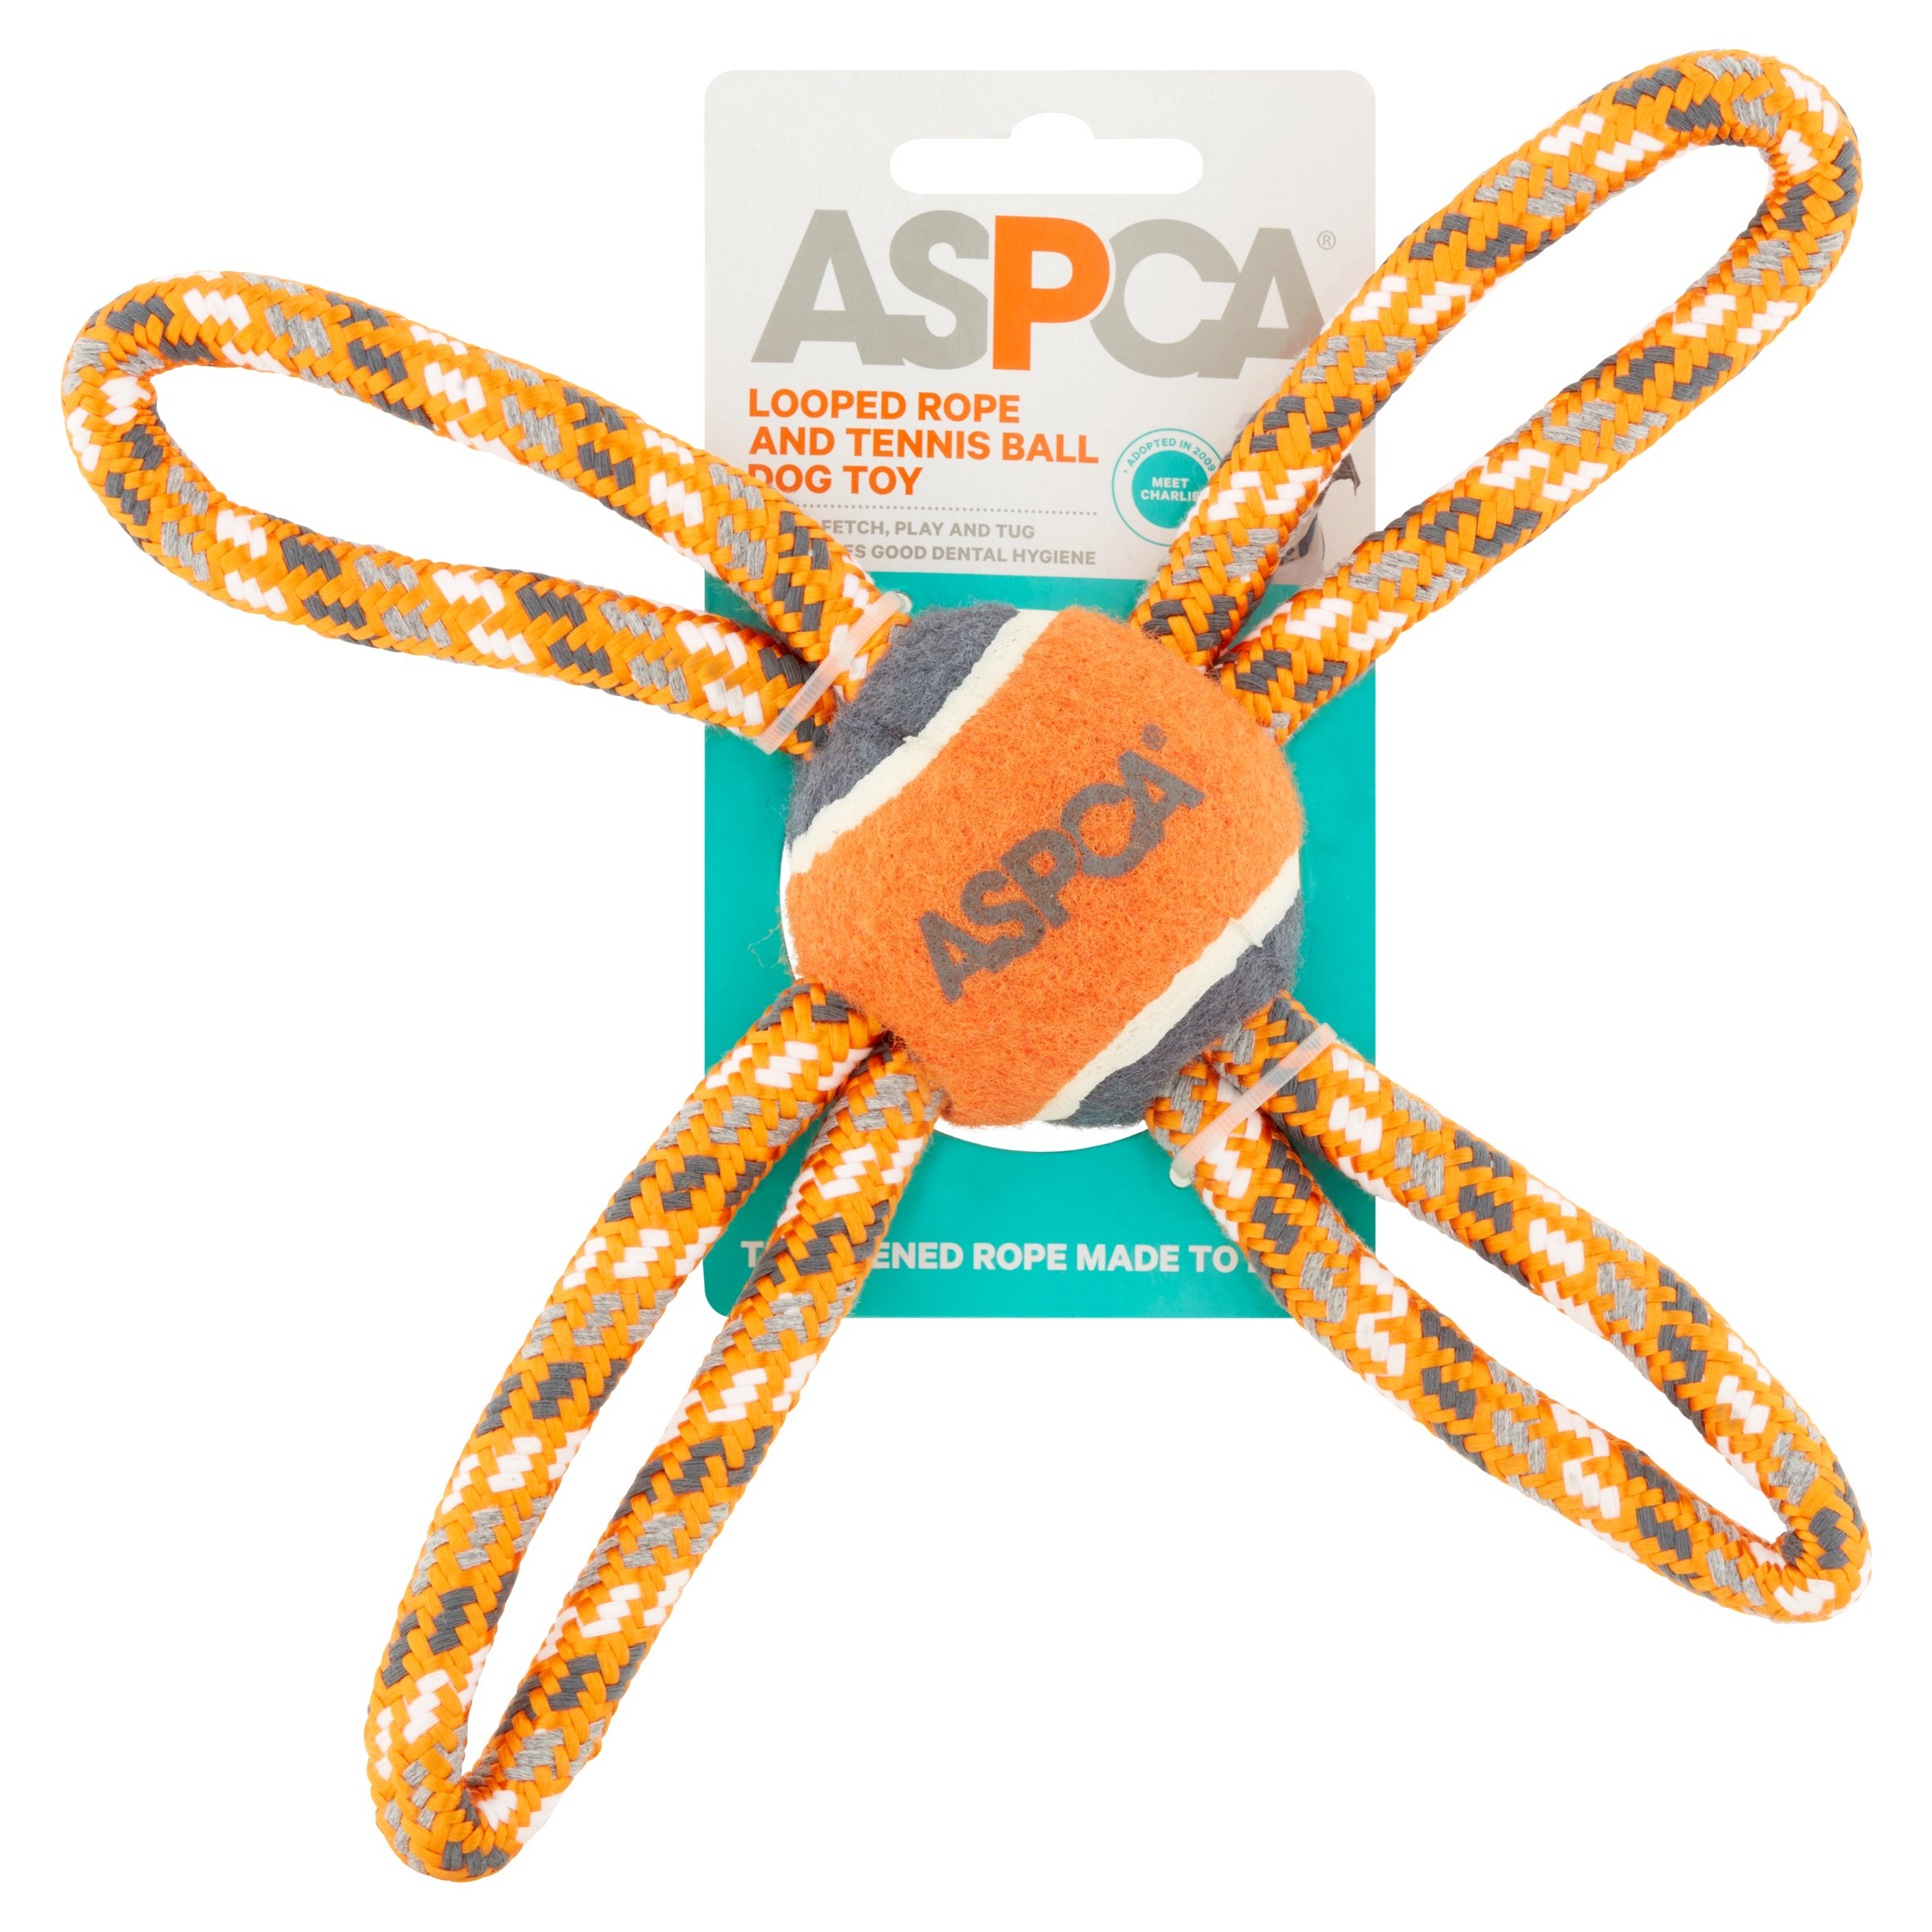 Aspca Looped Rope And Tennis Ball Dog Toy Walmart Com